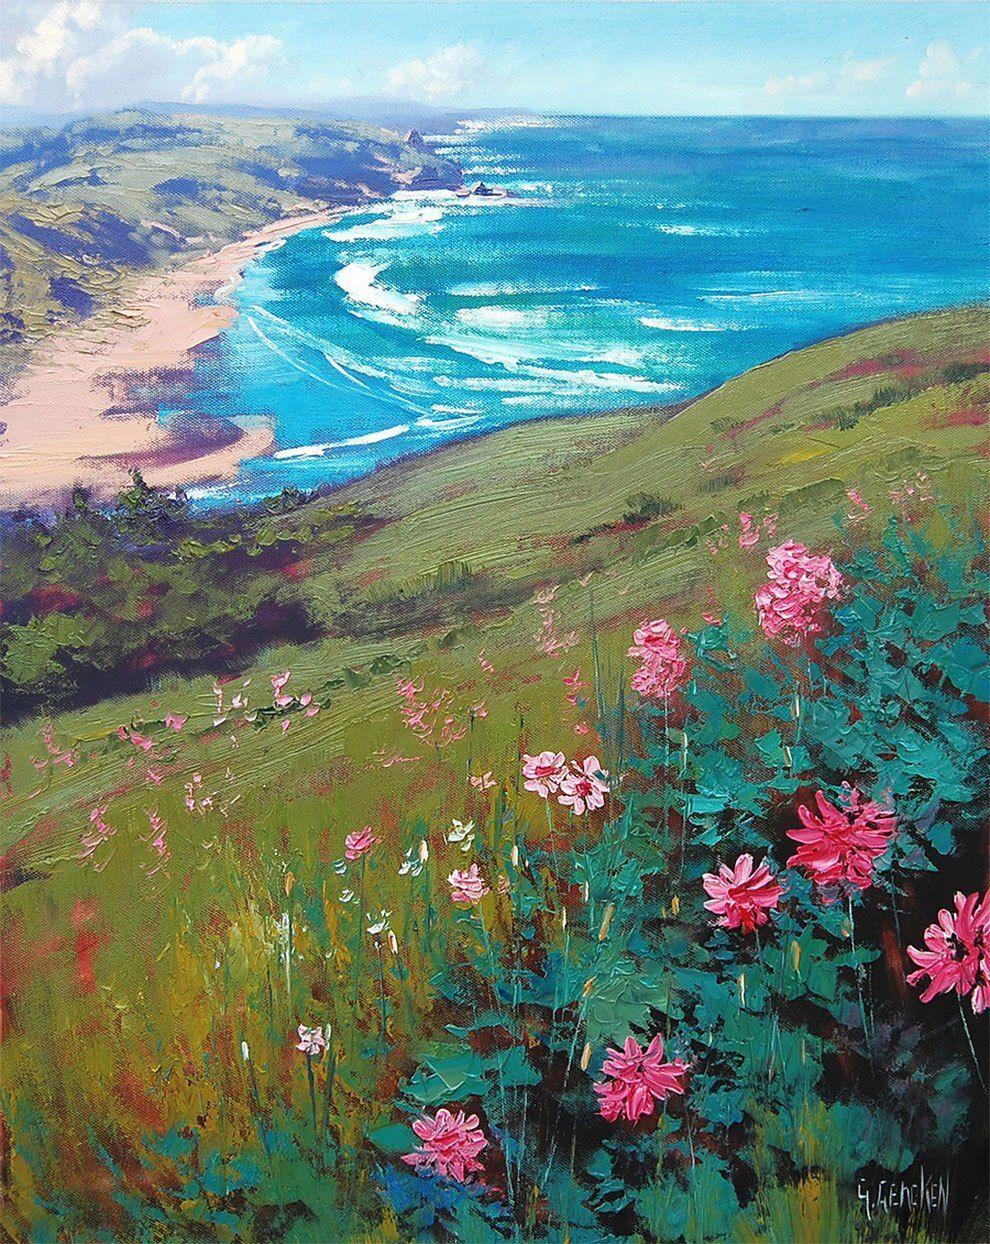 Beautiful Australian Landscape Oil Paintings -  Graham Gercken is an award winning Australian landscape painting artist who was born in 1960. He is - #australian #beautiful #IndianPaintings #landscape #oil #OilPaintings #Paintings